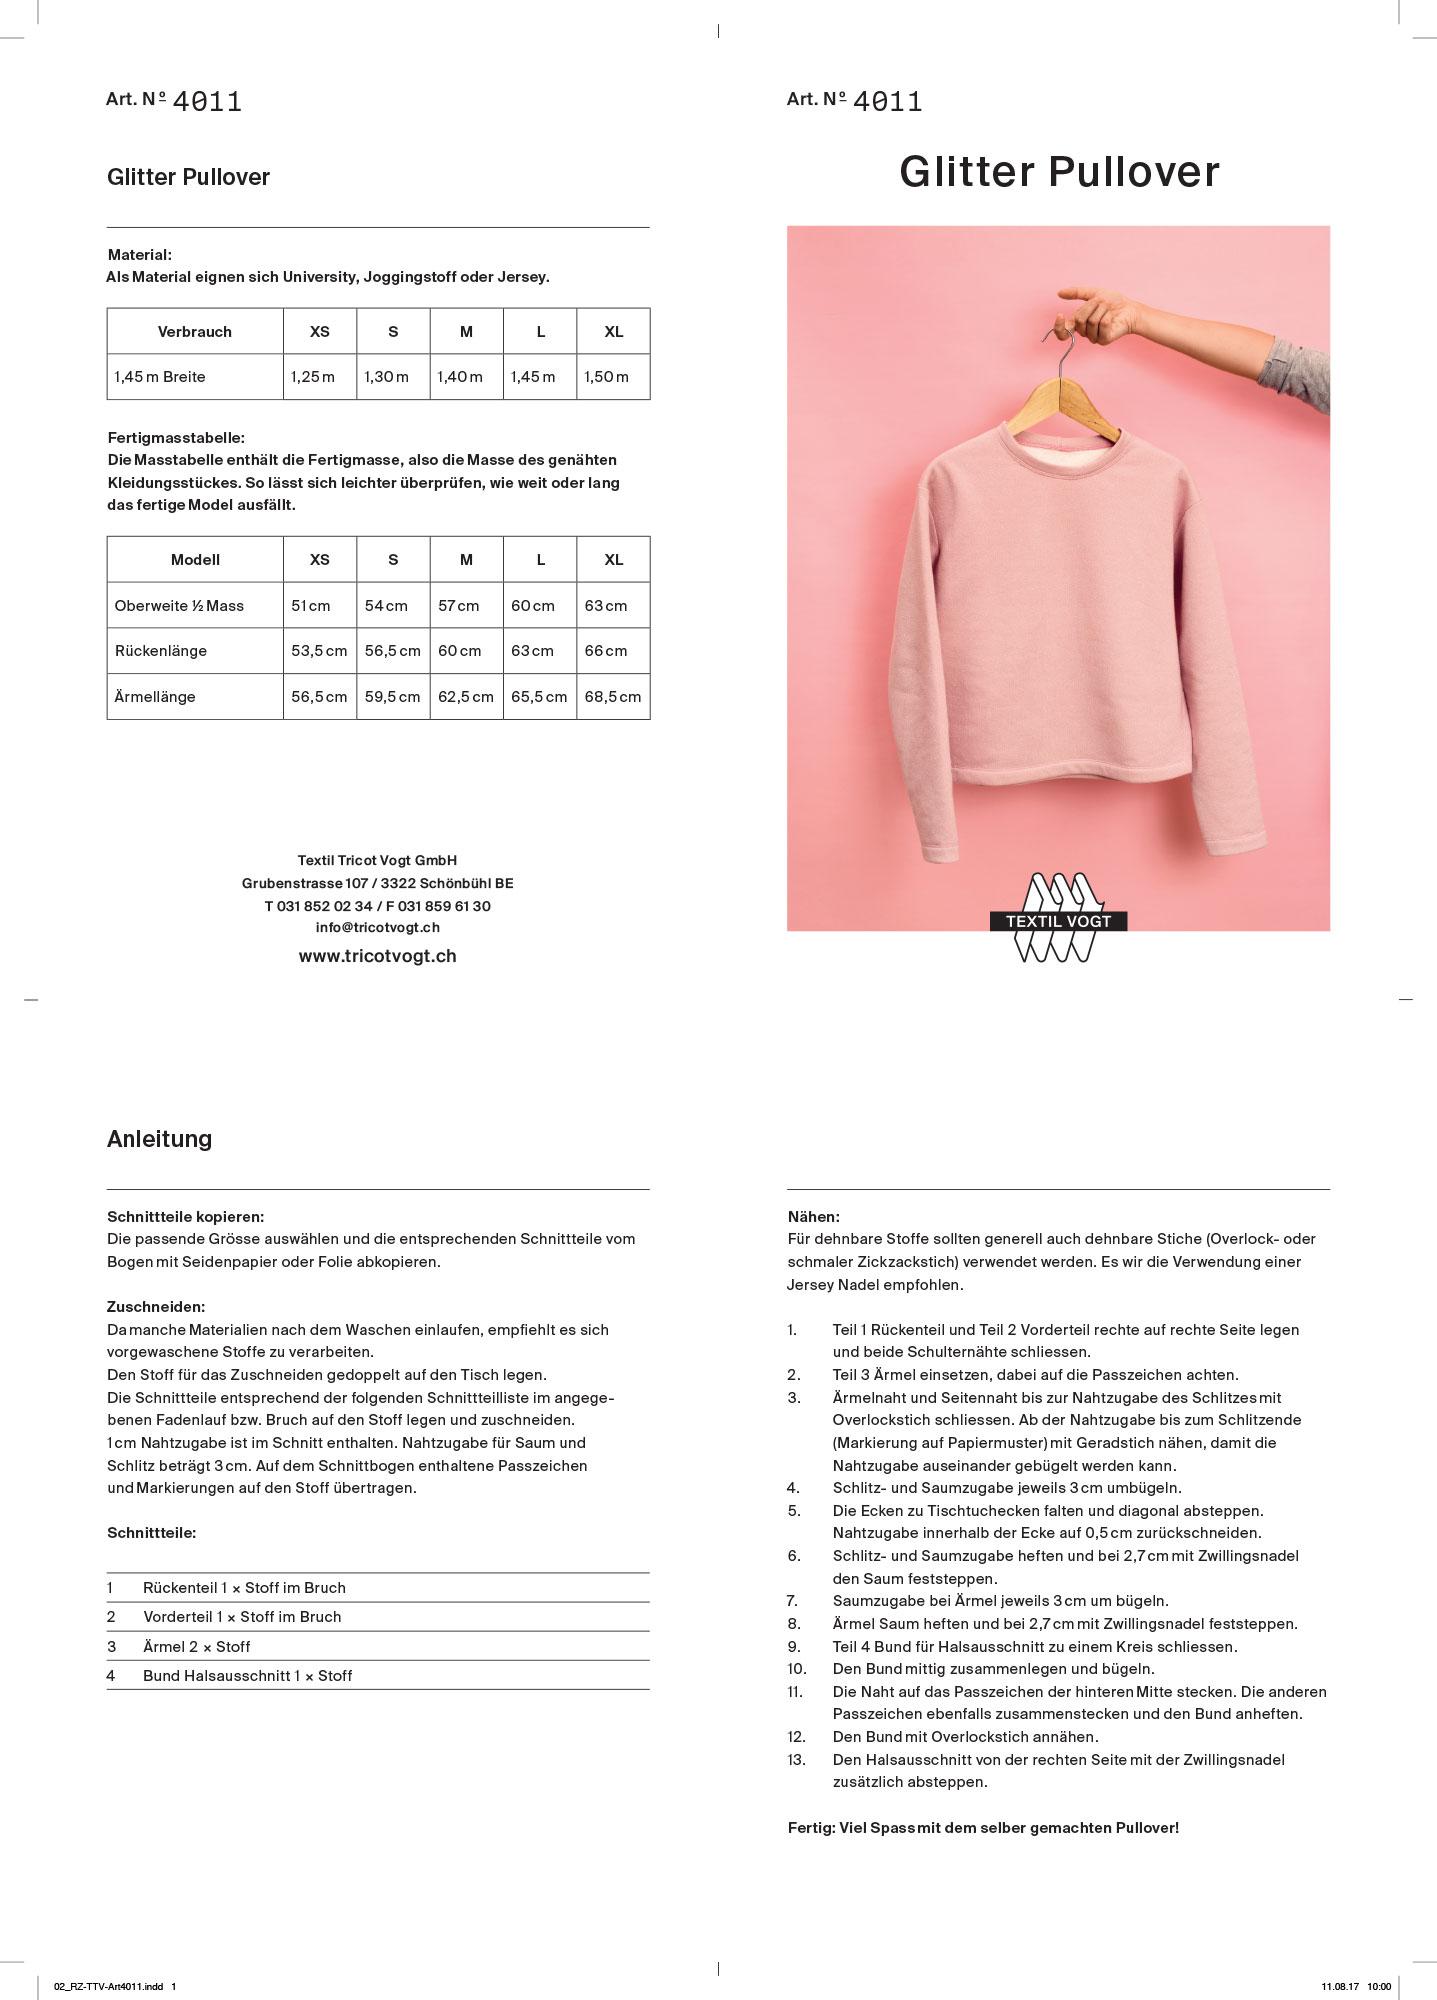 Textil Tricot Vogt – Schnittmuster 4011 ©Atelier Pol